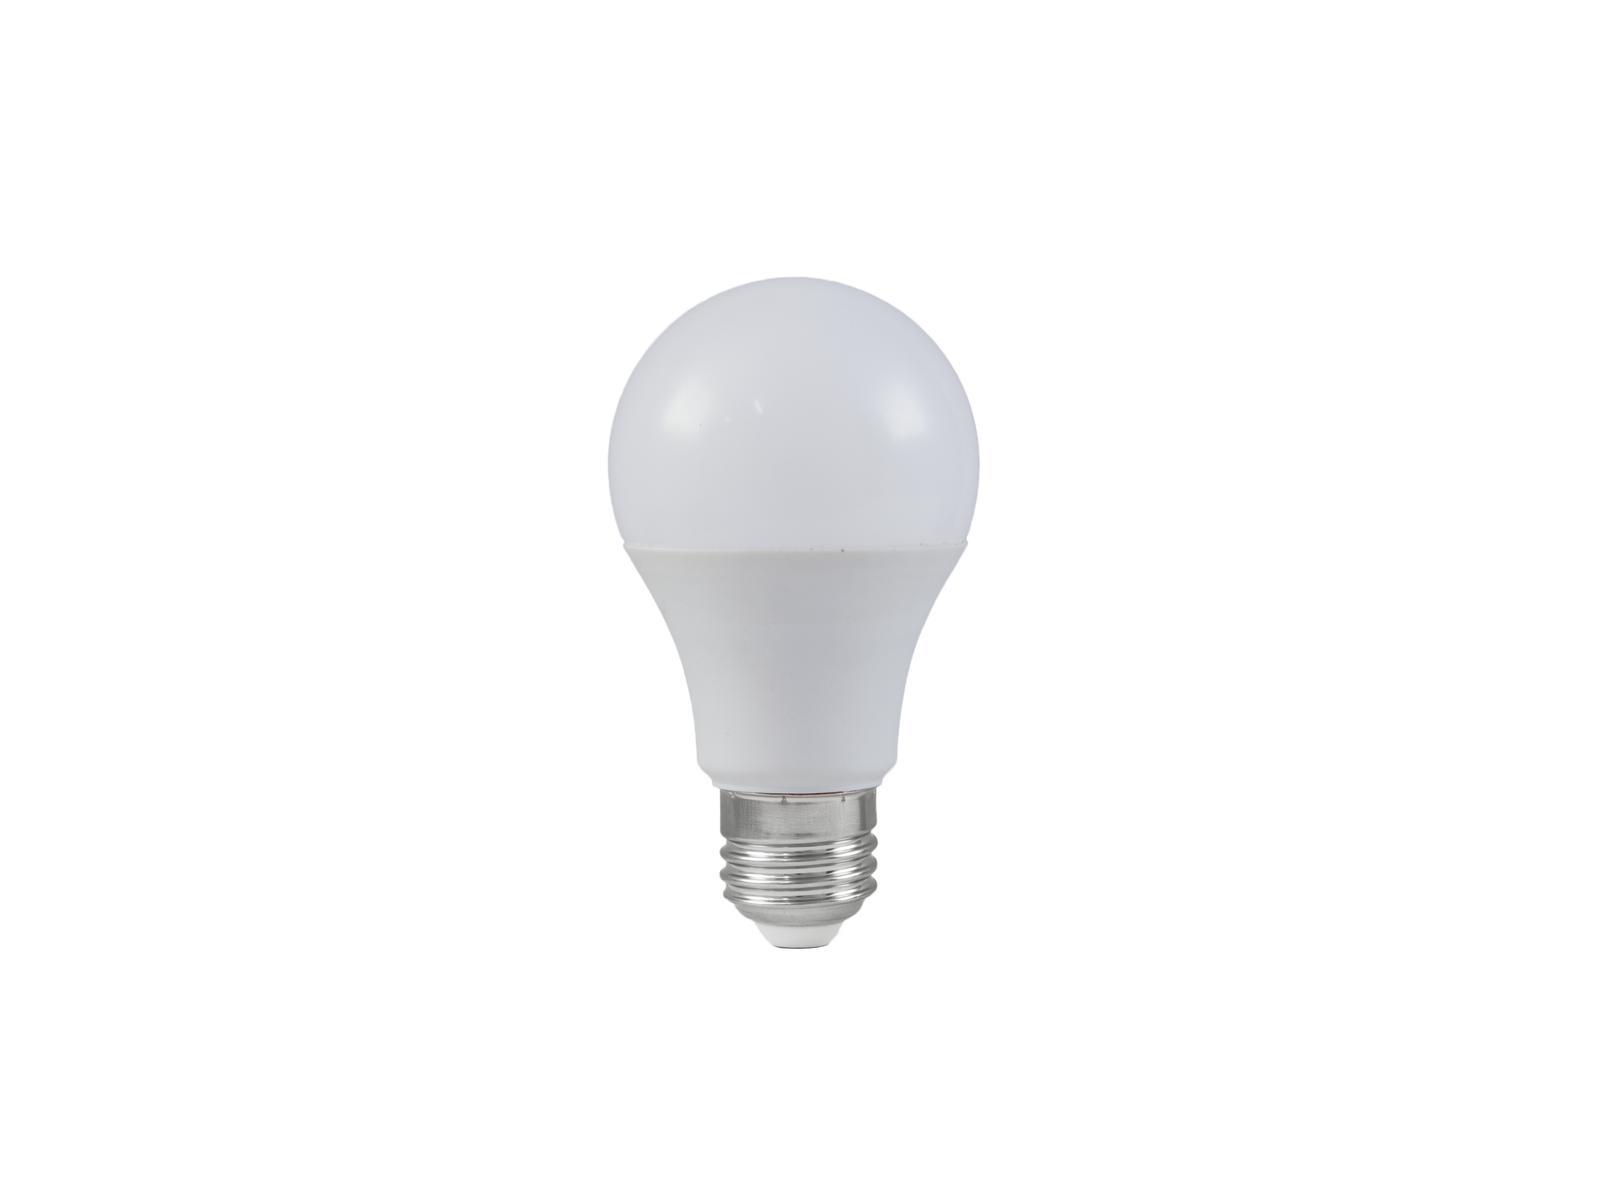 Lampada a led bianca A60 230V 3W E-27 3200K OMNILUX